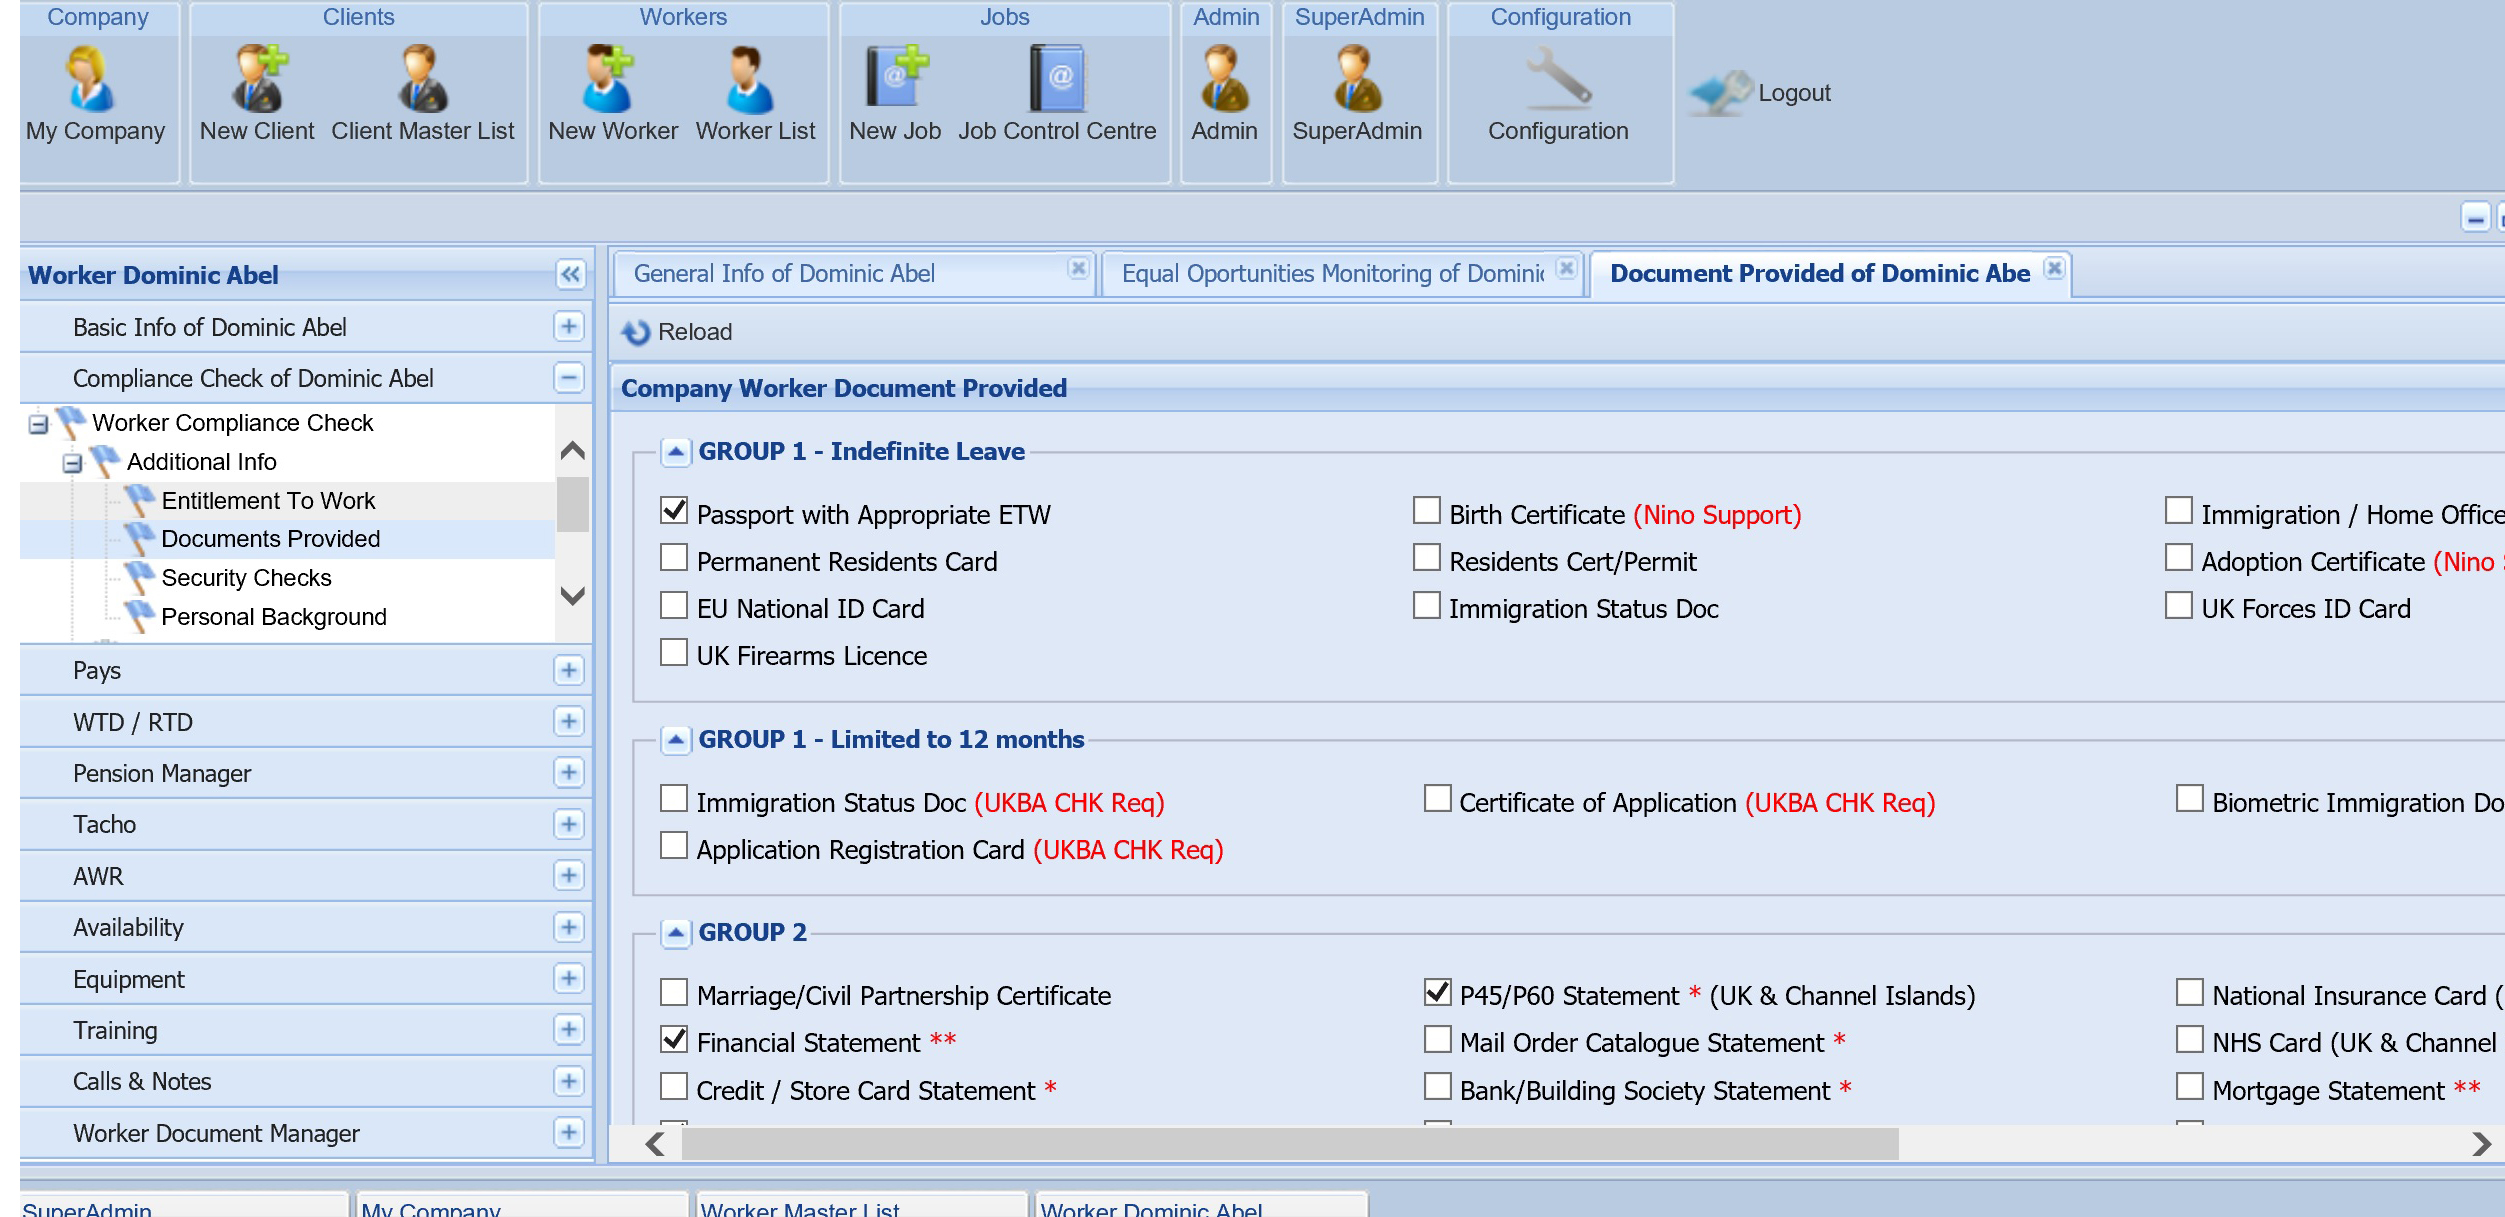 workerdatabase-1